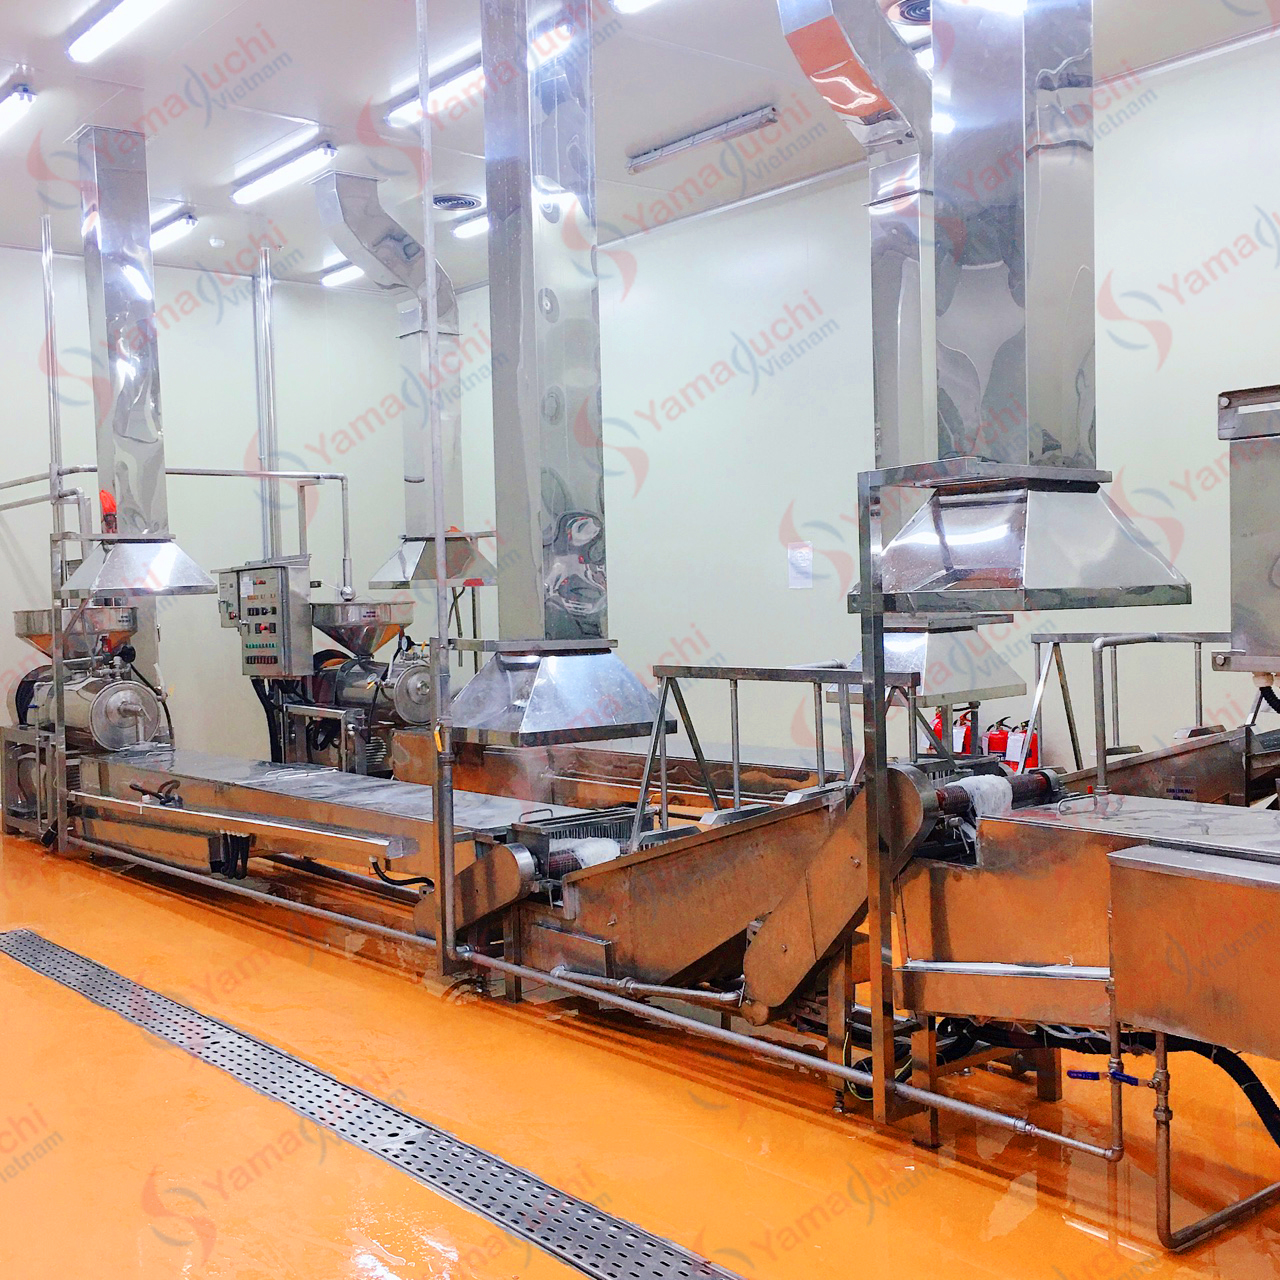 Automatic fresh rice vermicelli noodle production line